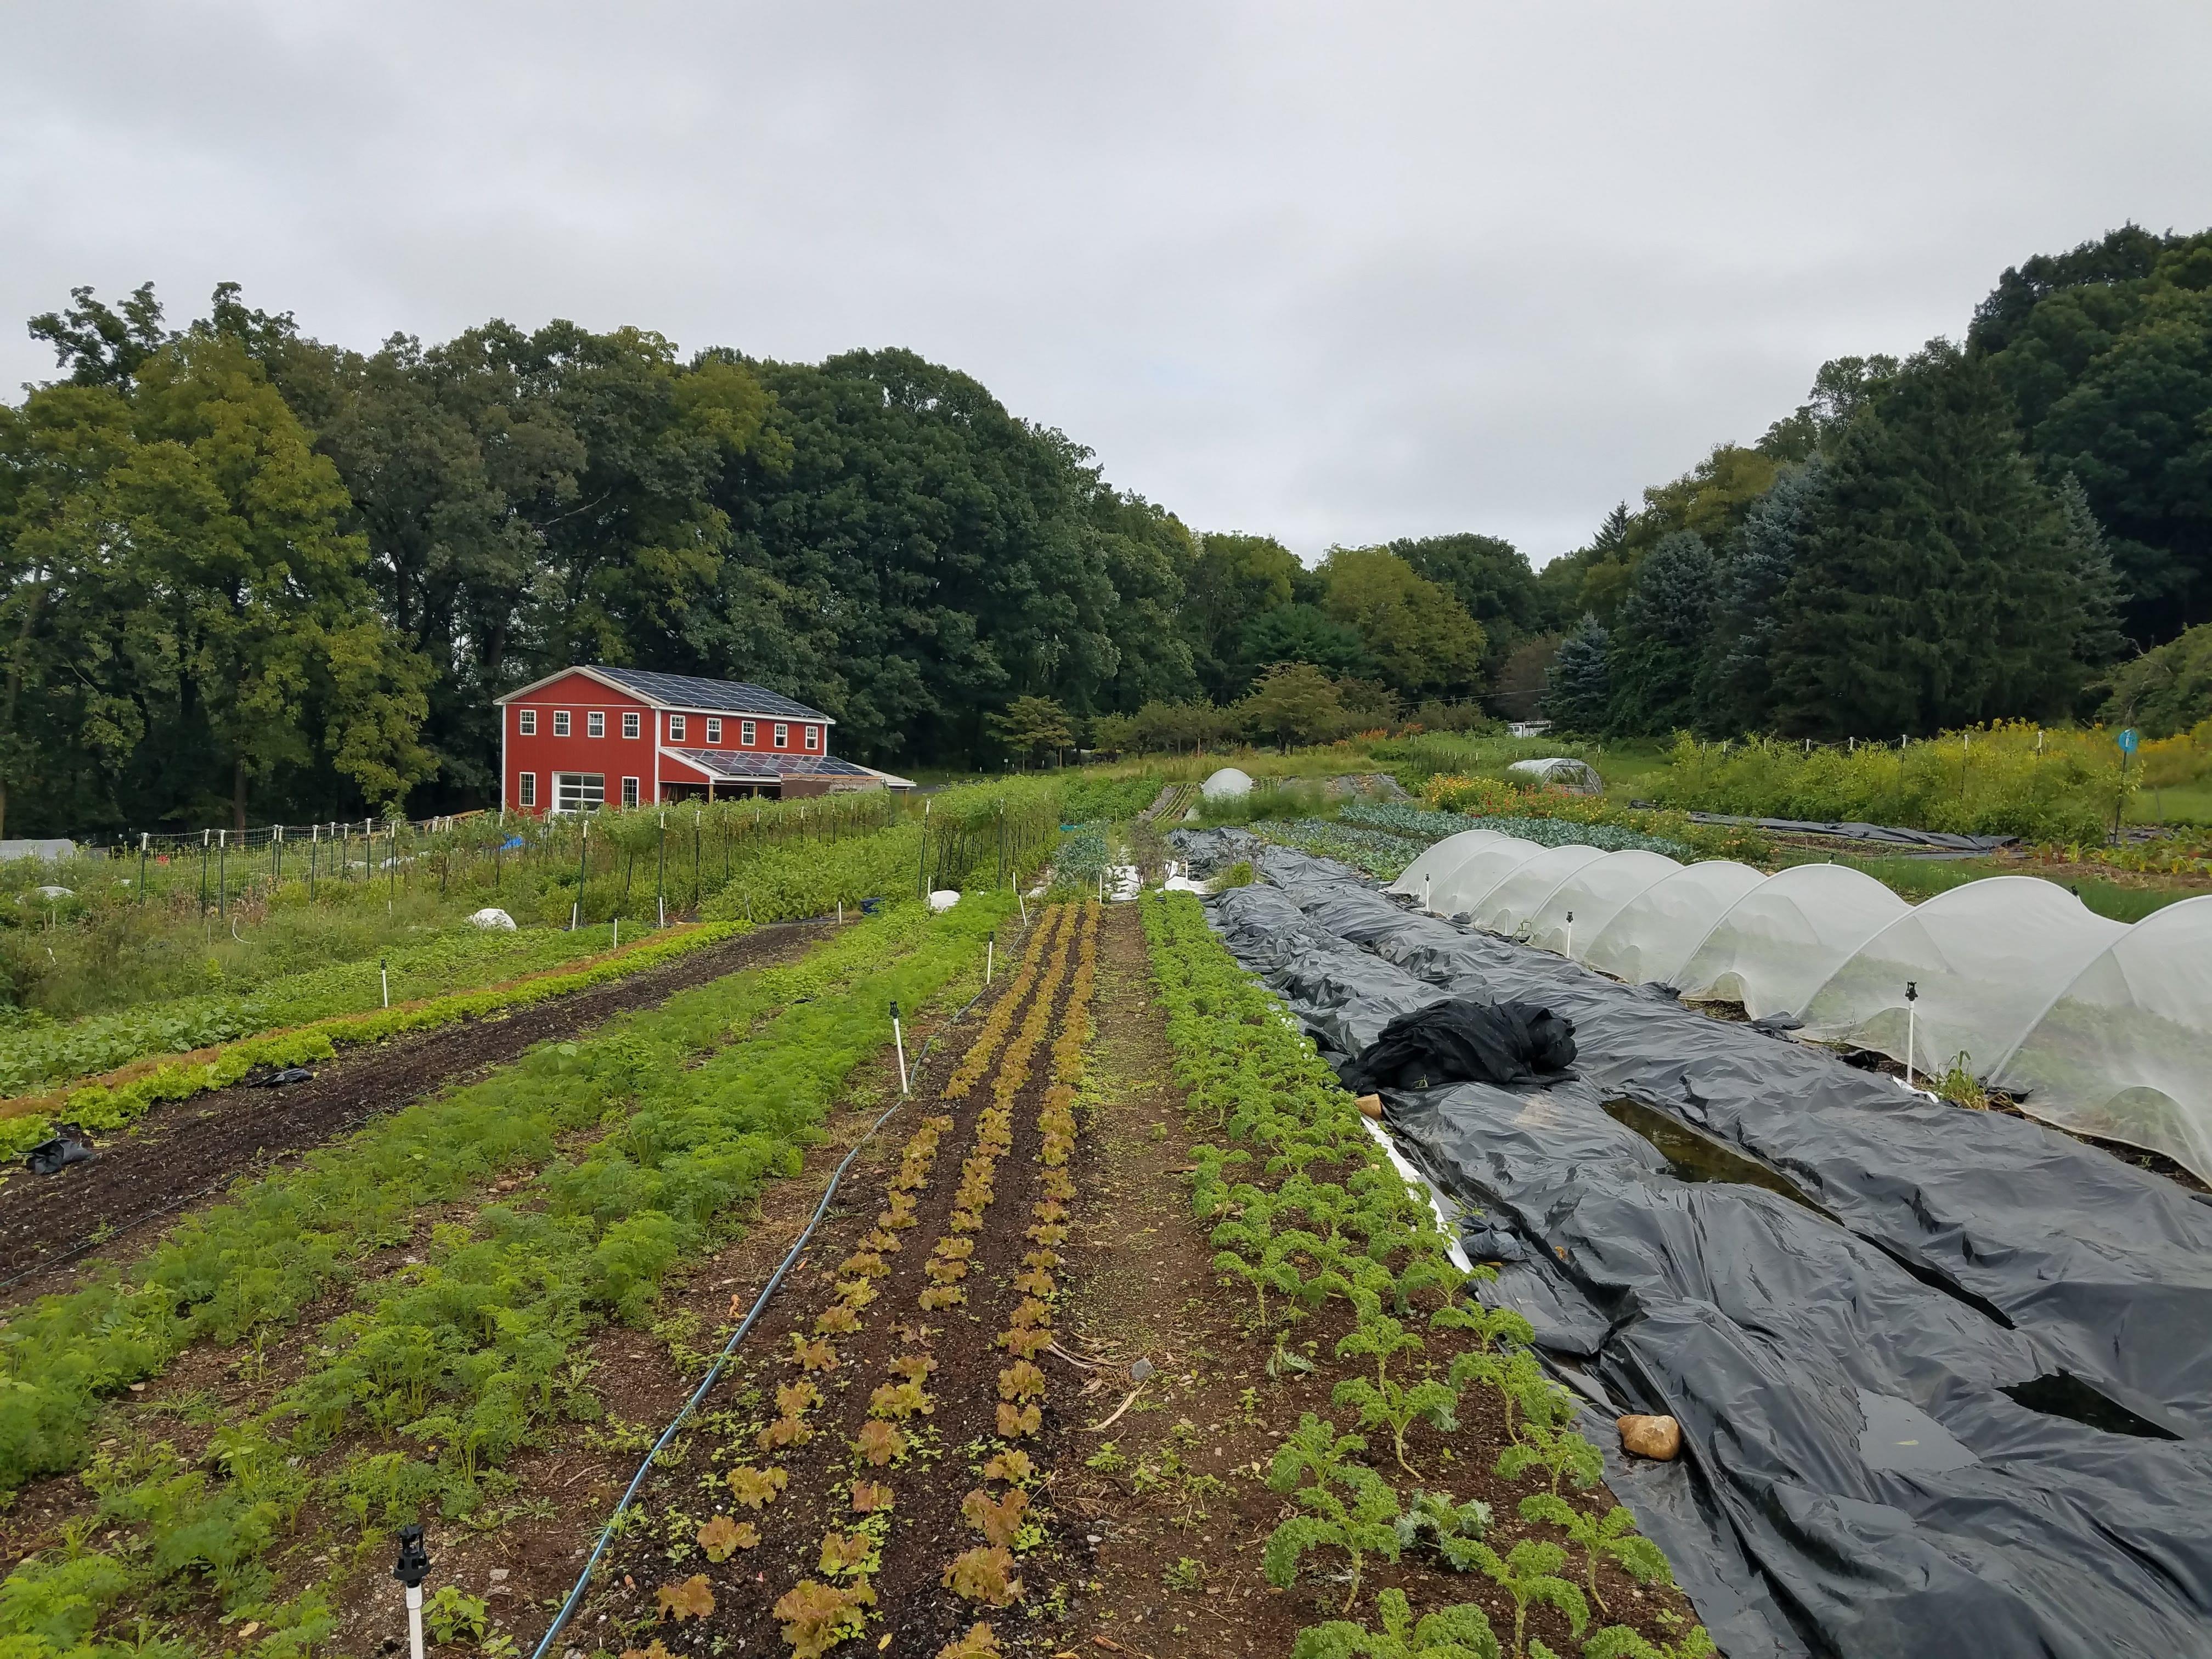 1.5 Acre No-till CSA Farm Hiring Main Season Farmhands for 2020